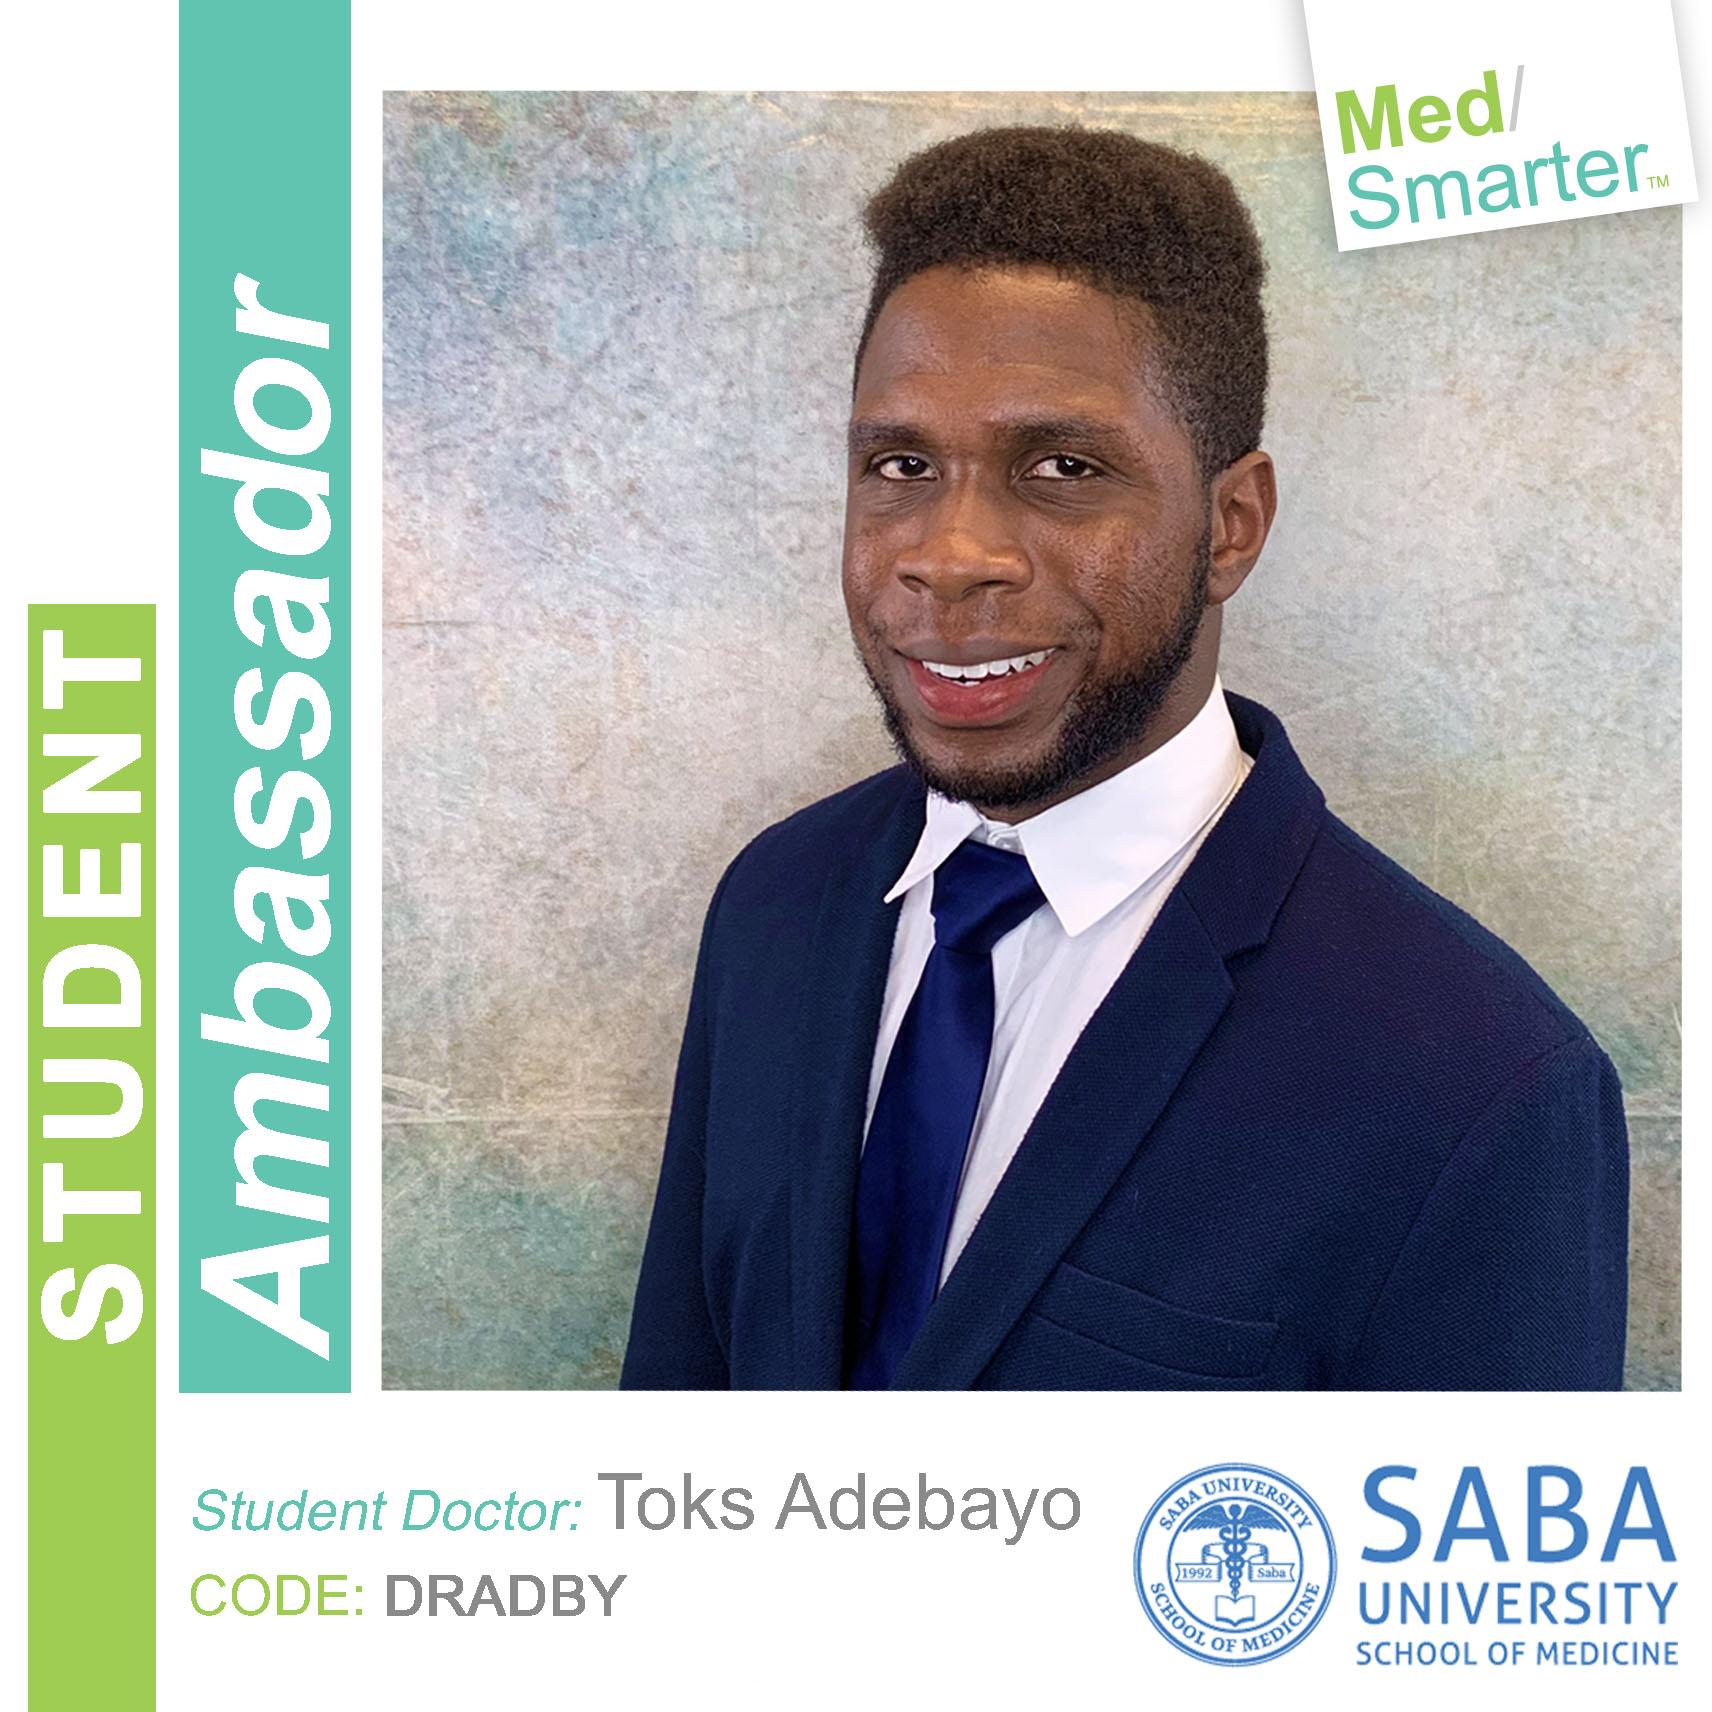 MedSmarter Student Ambassador Toks Adebayo